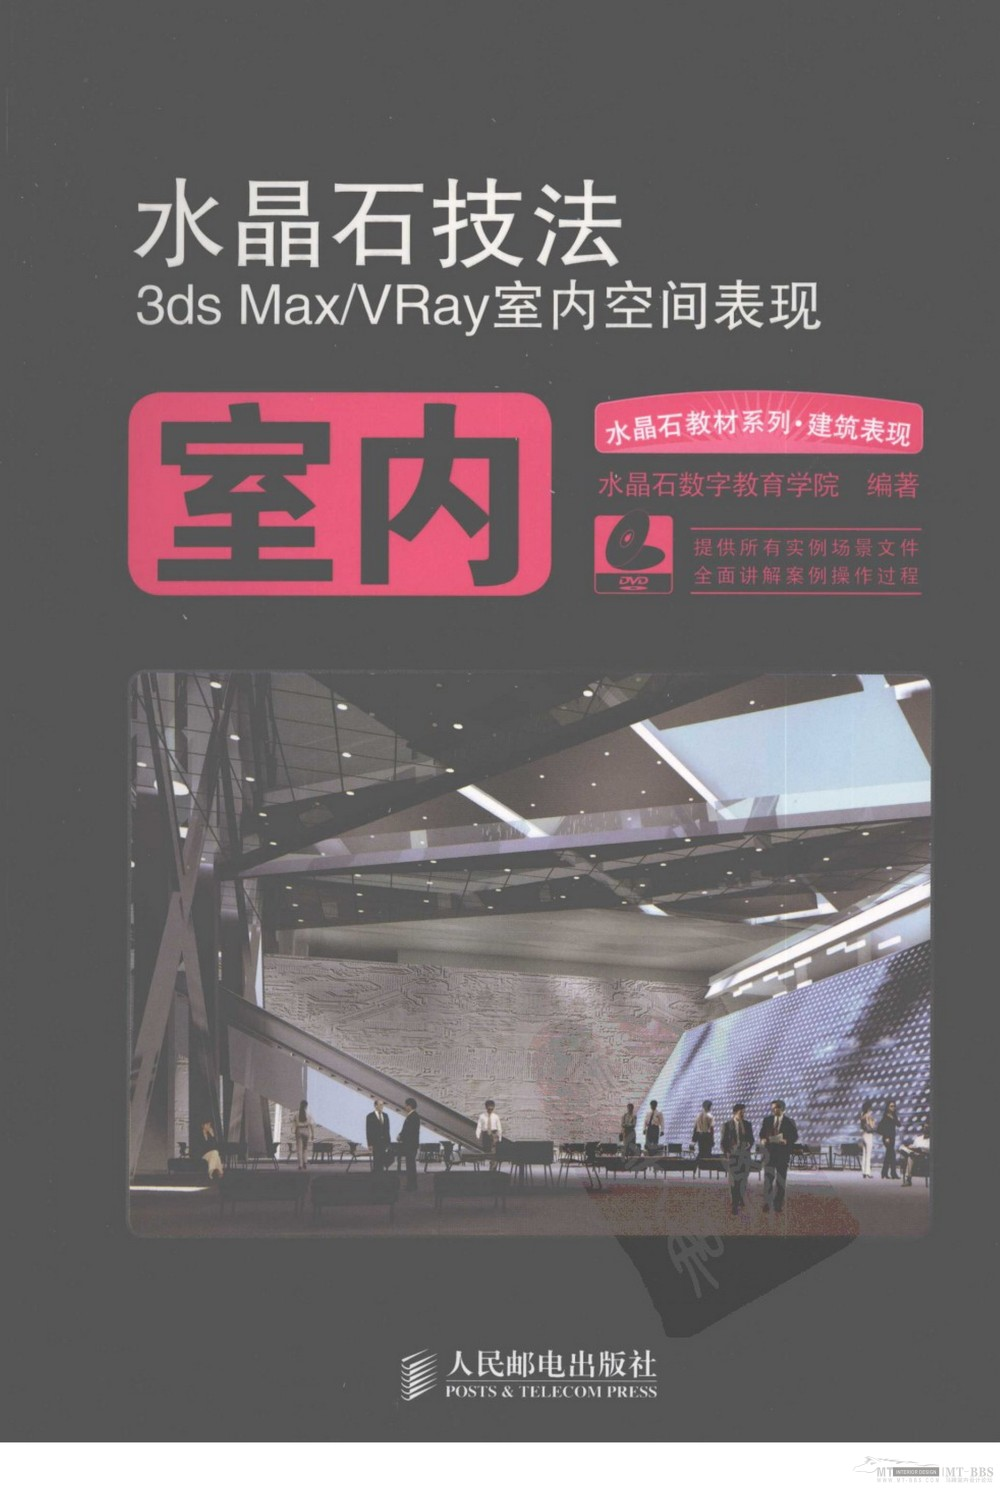 水晶石技法-3ds_Max&VRay室内空间表现_水晶石技法-3ds_Max&VRay室内空间表现_页面_001.jpg